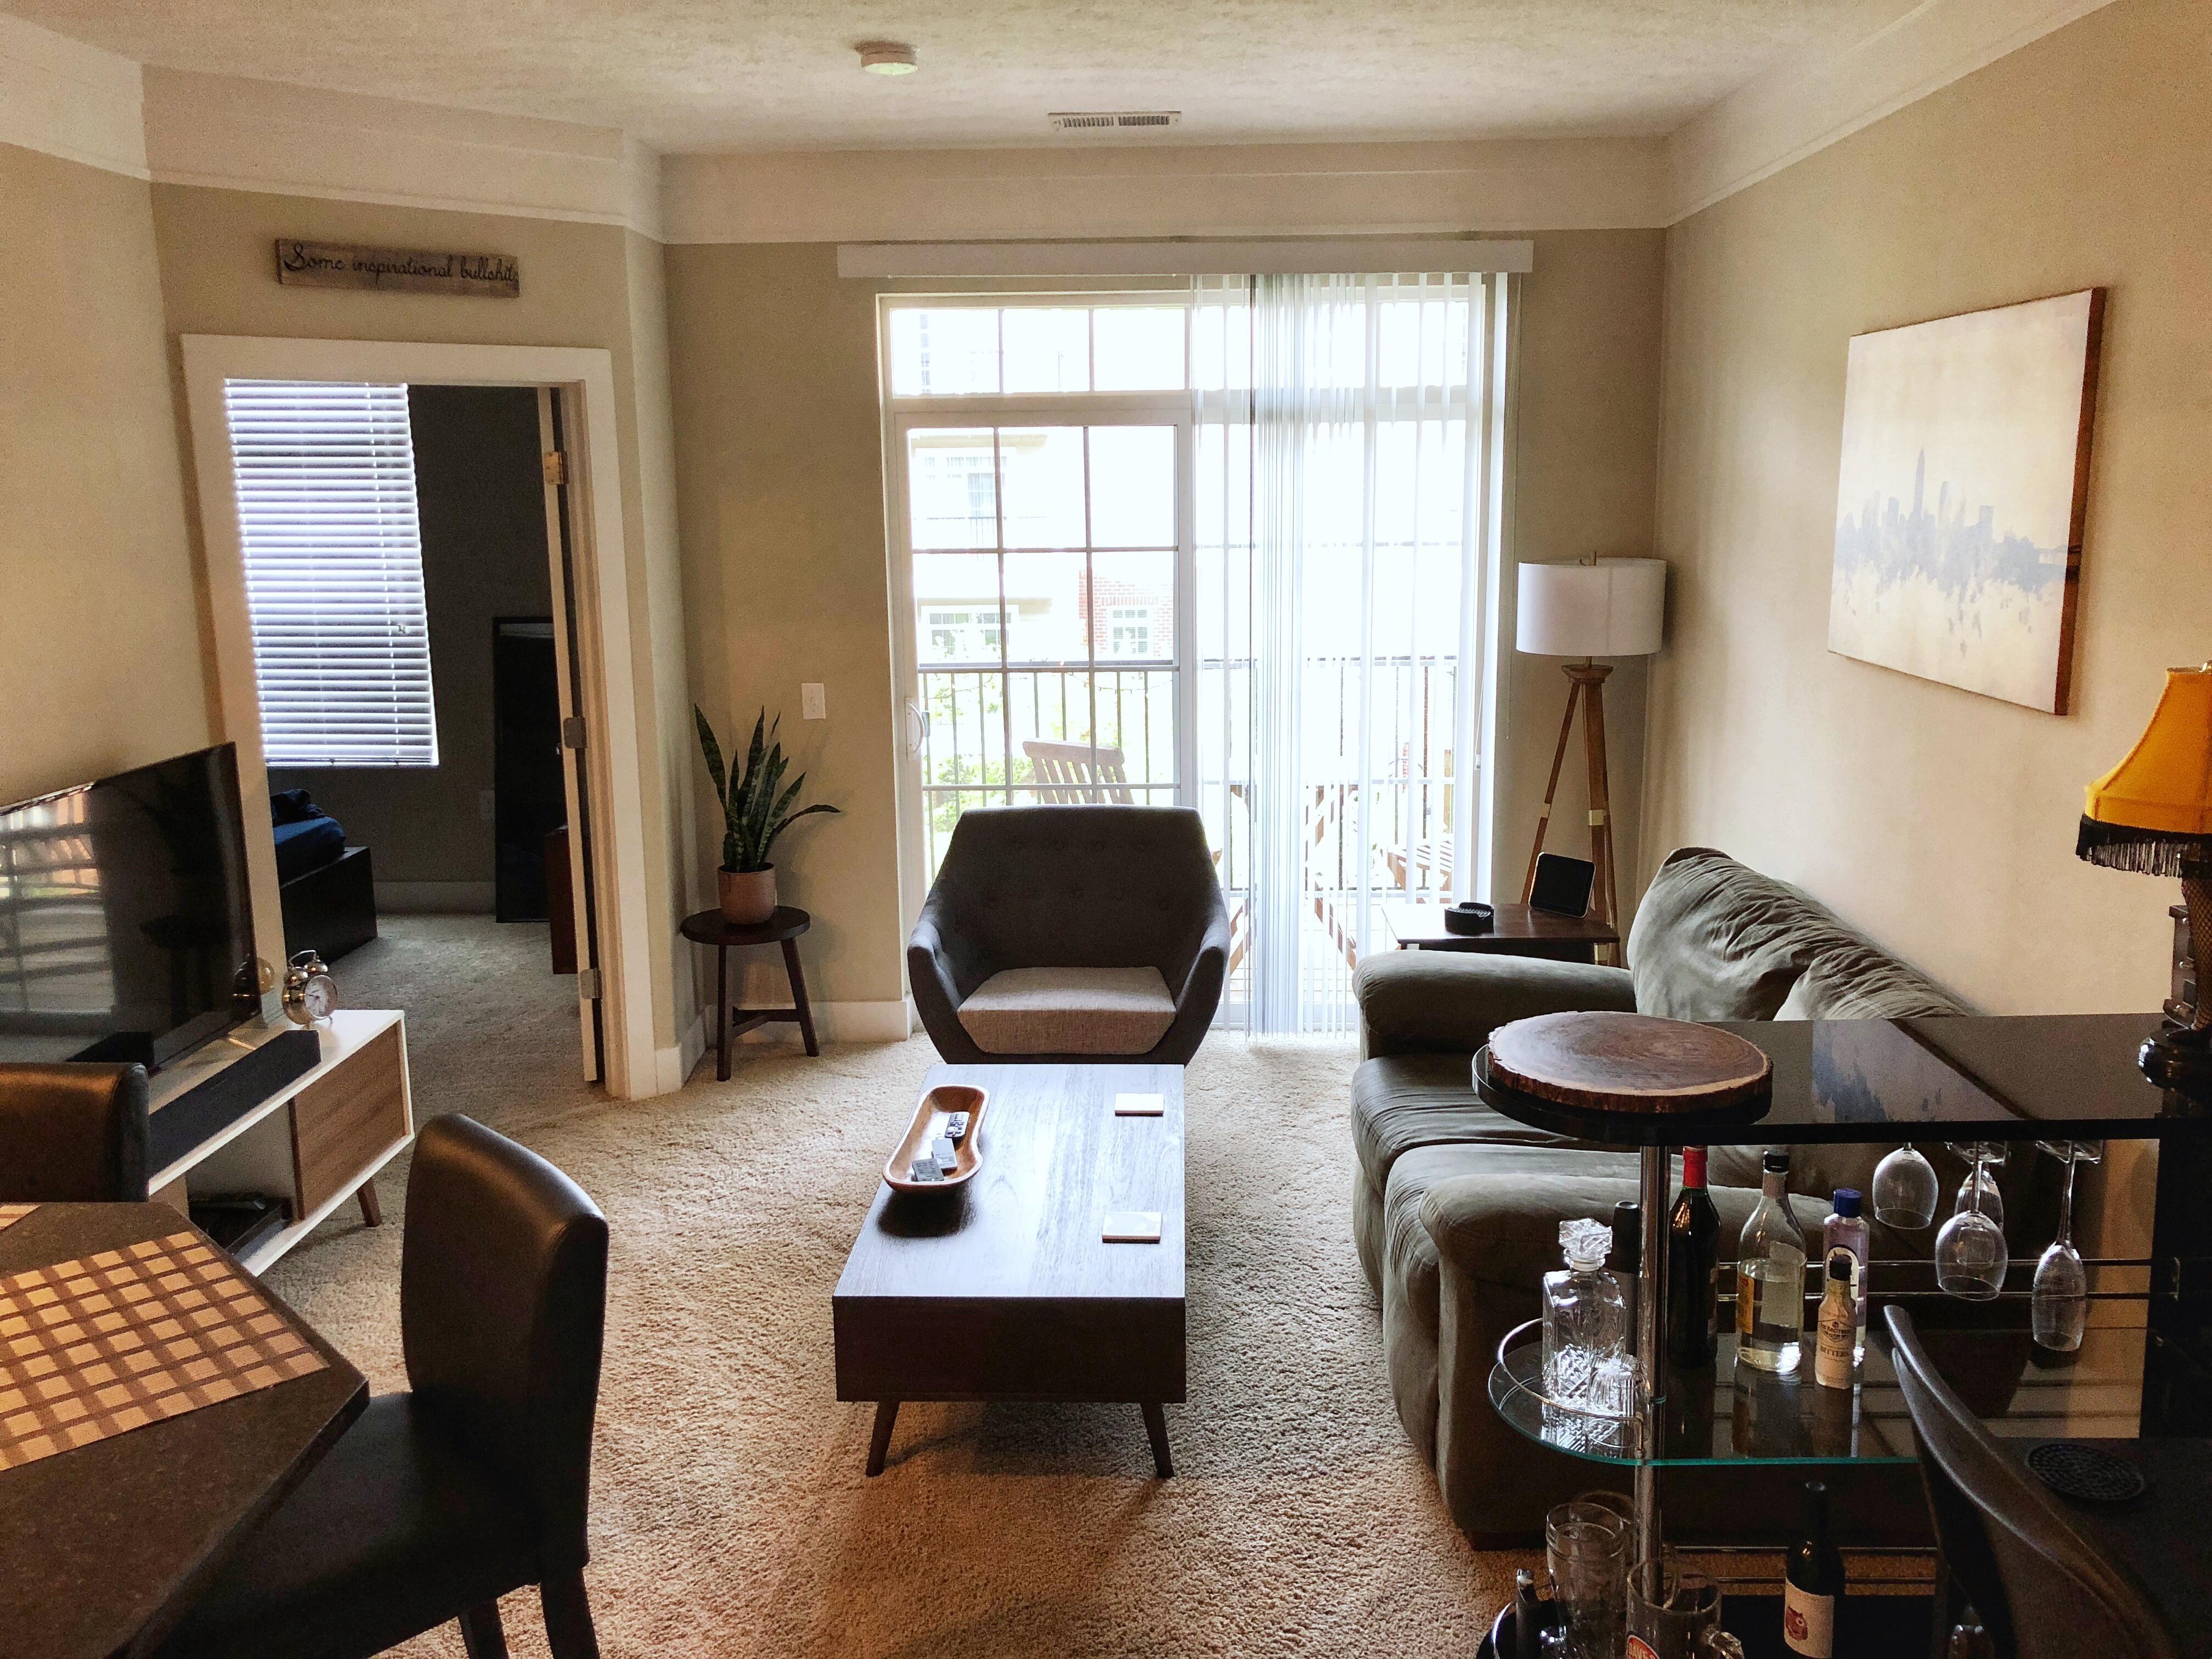 One Bedroom Studio Apartments College Station